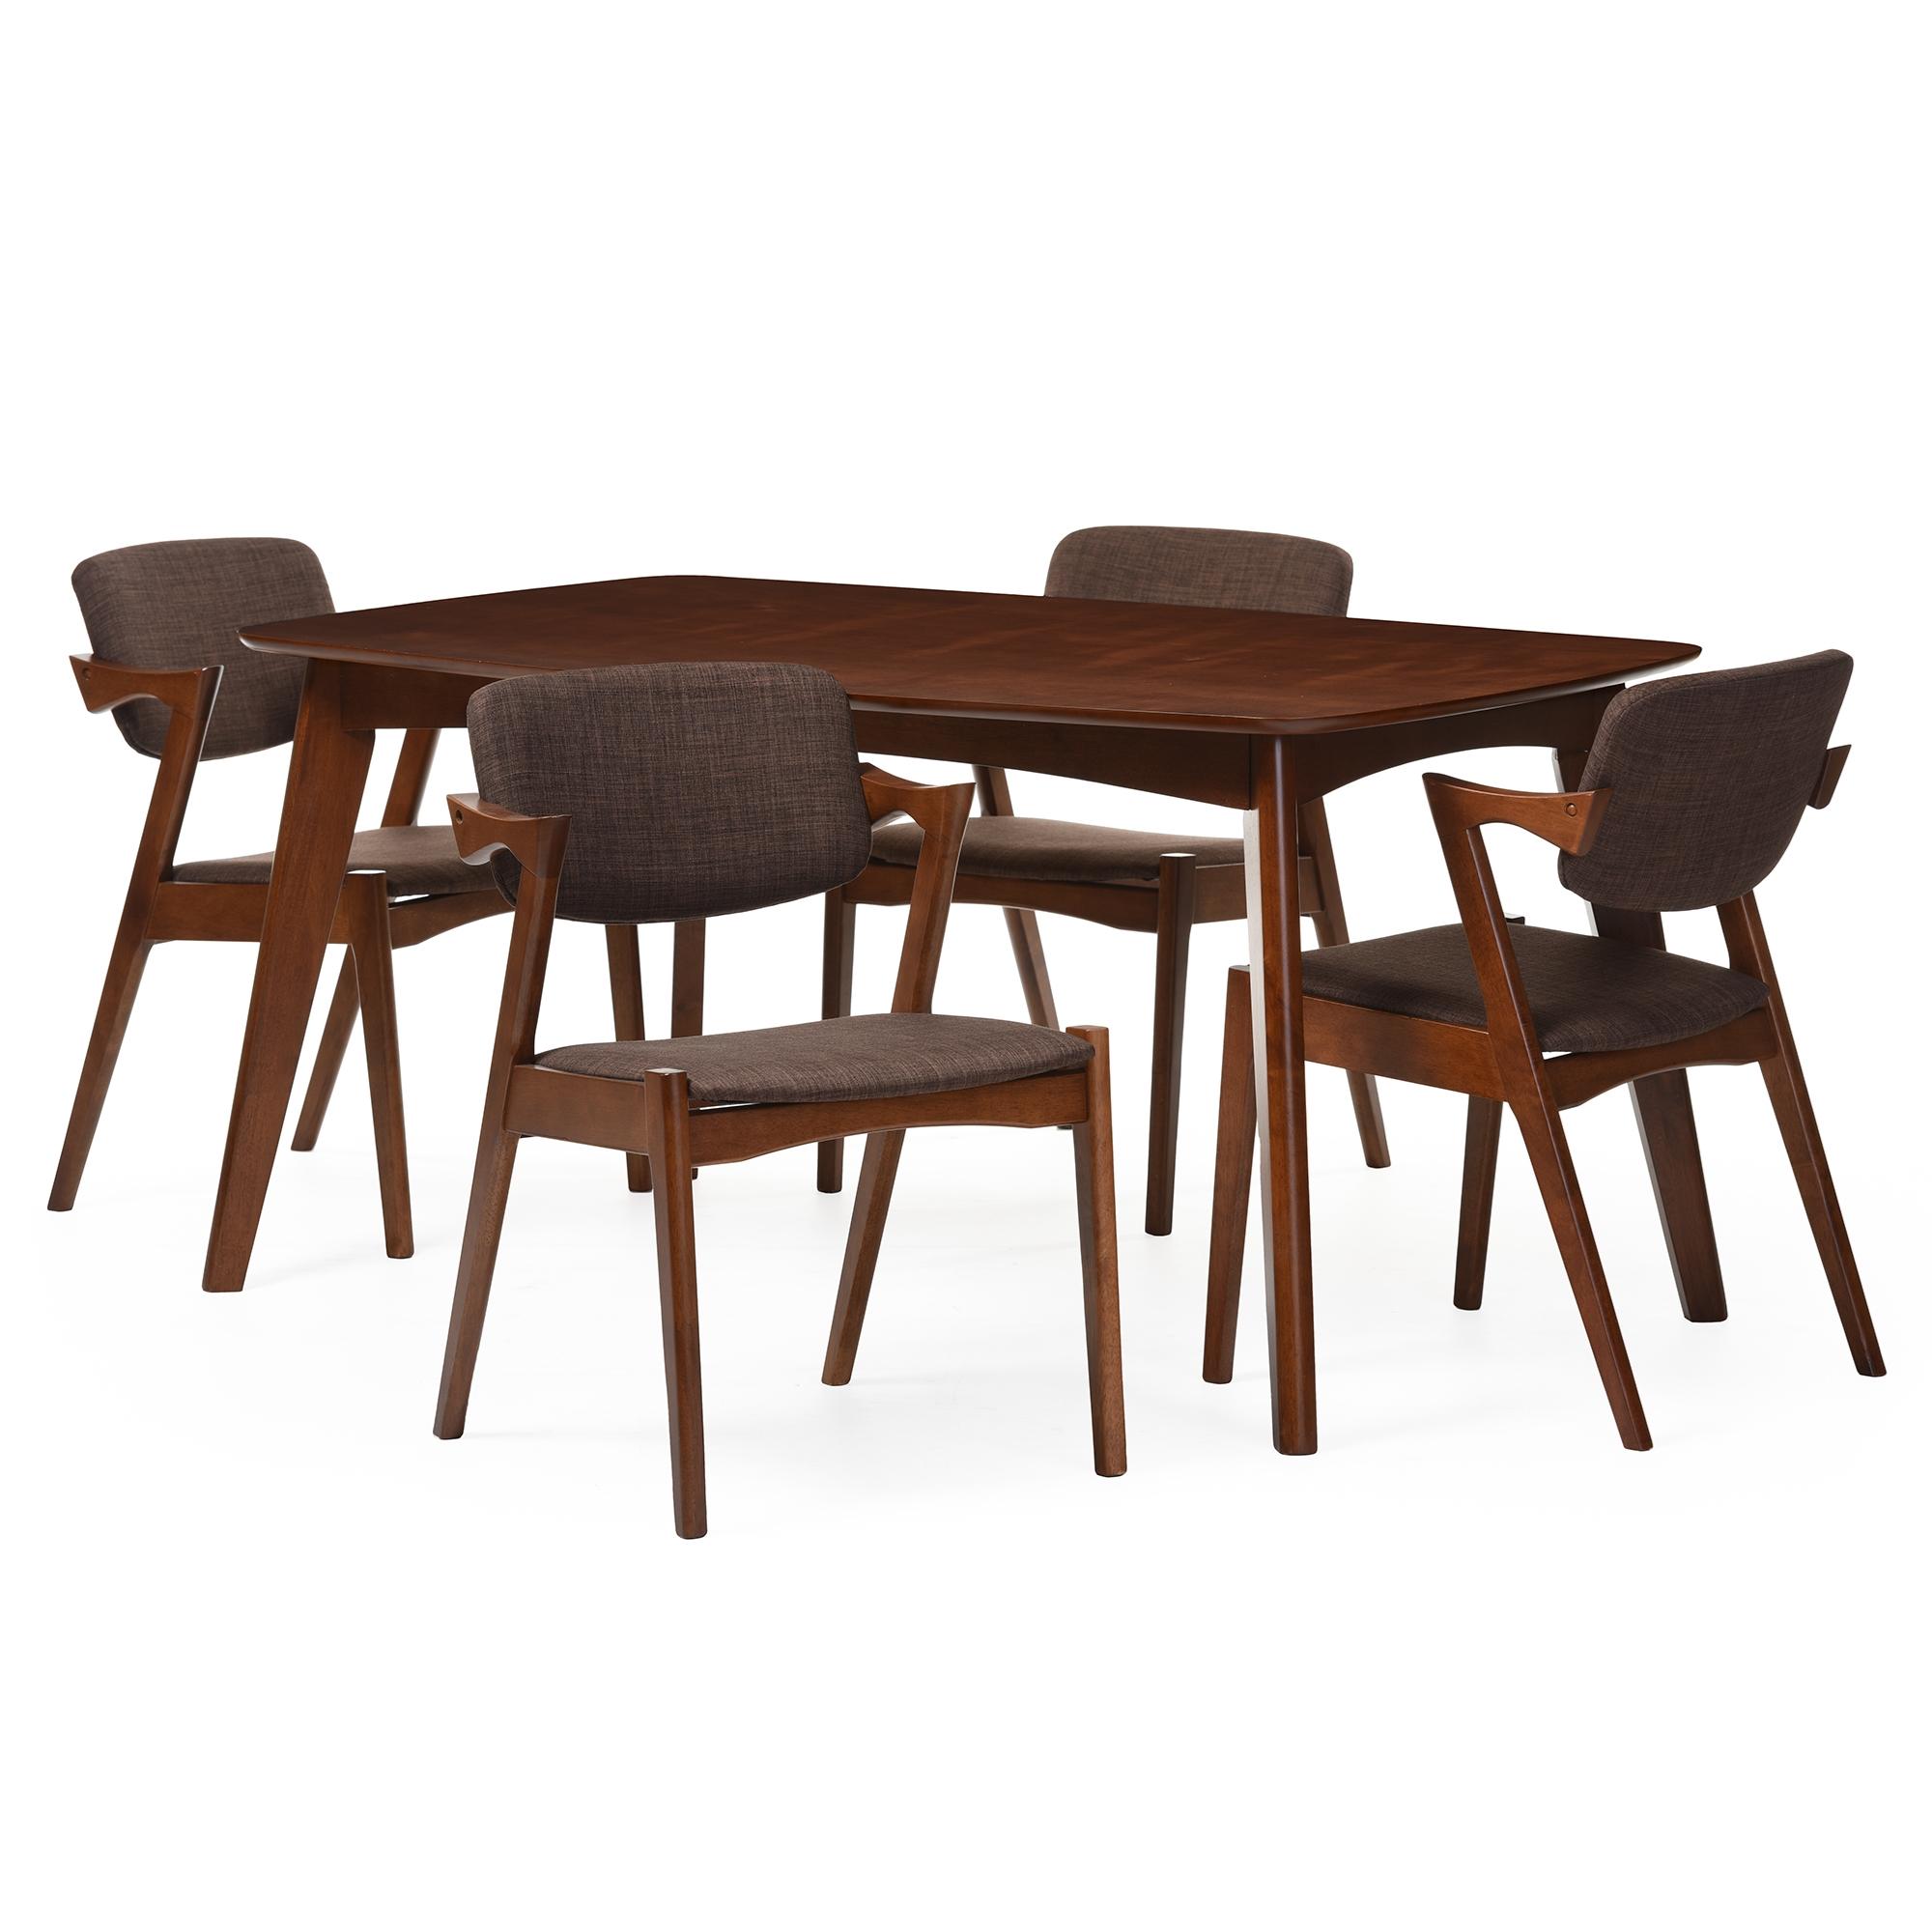 Wonderful Baxton Studio | Wholesale Dining Sets | Wholesale Dining Room Furniture | Wholesale  Furniture